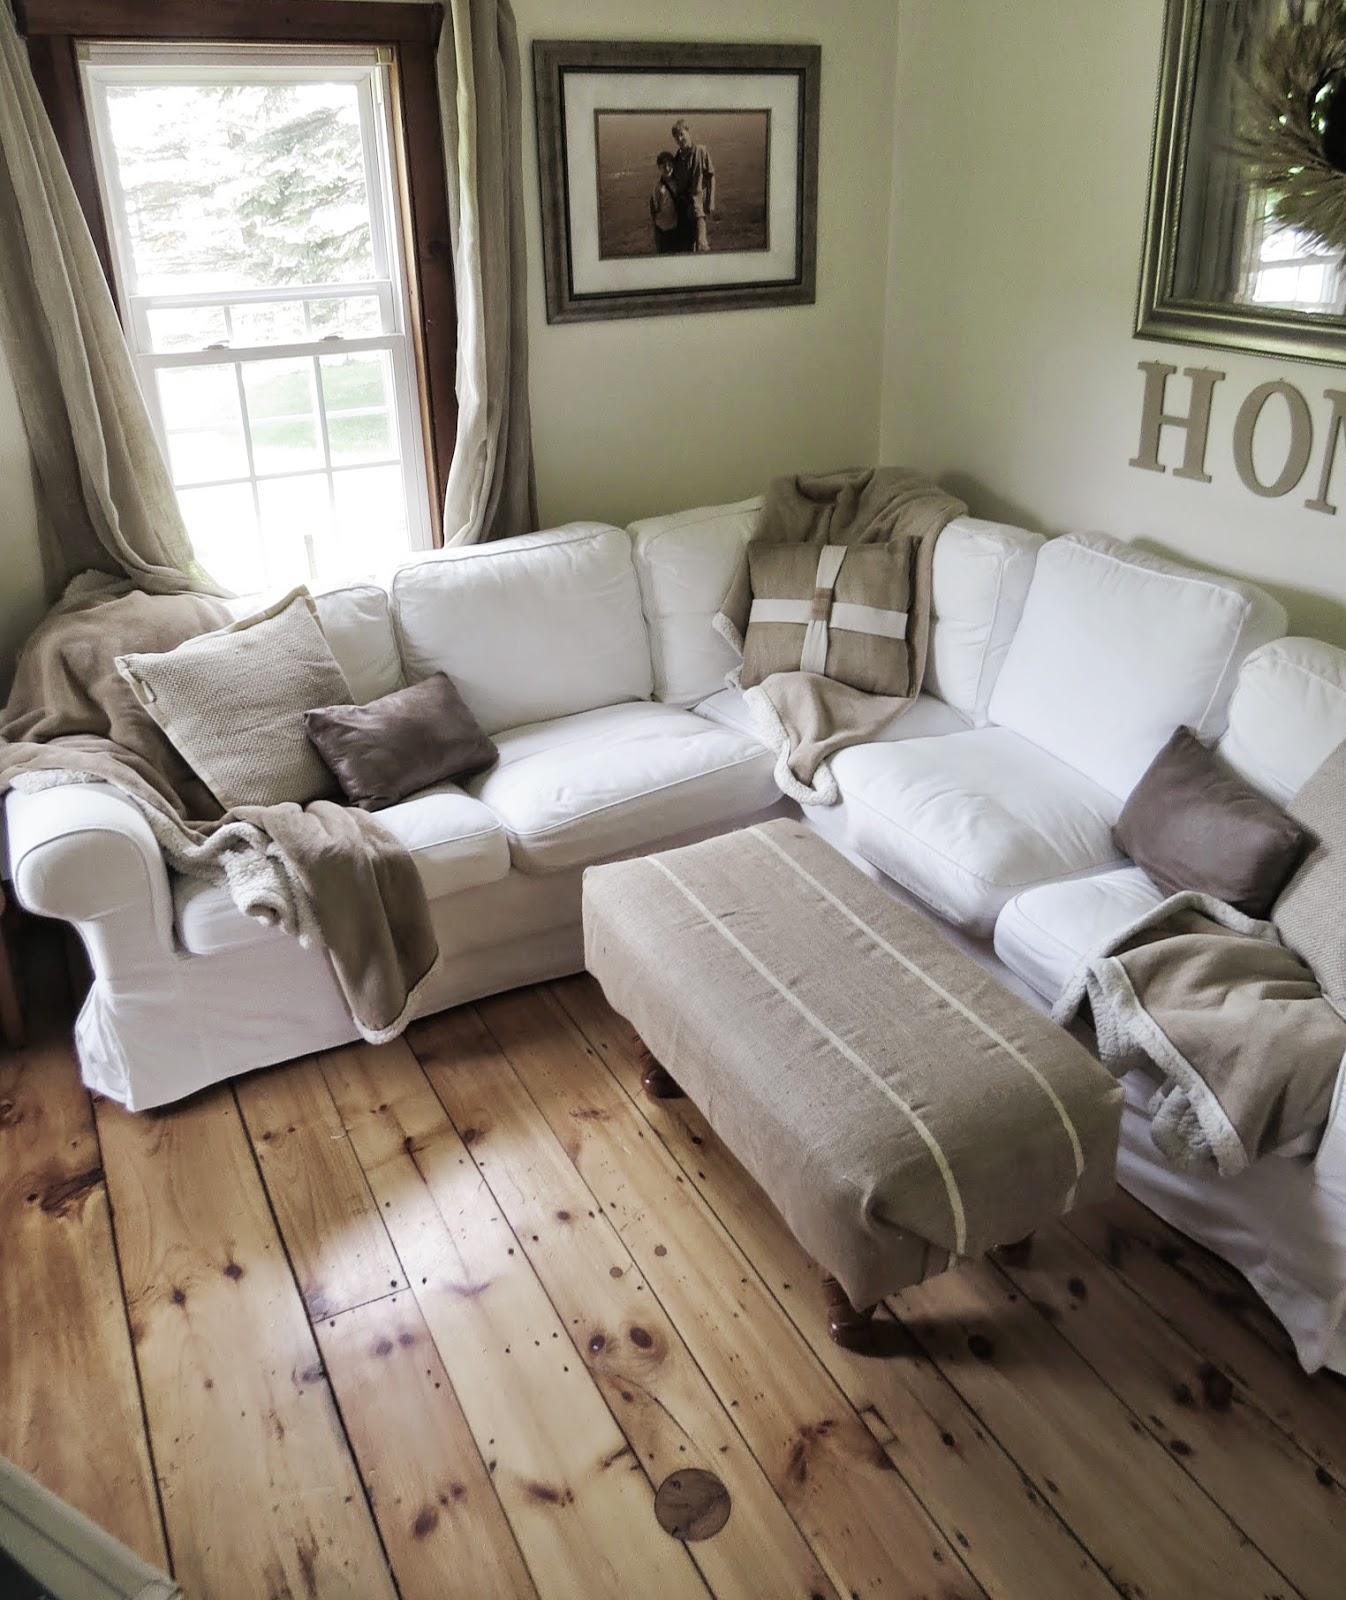 Sensational The Long Awaited Home Ikea Ektorp Footstool Ottoman Ocoug Best Dining Table And Chair Ideas Images Ocougorg